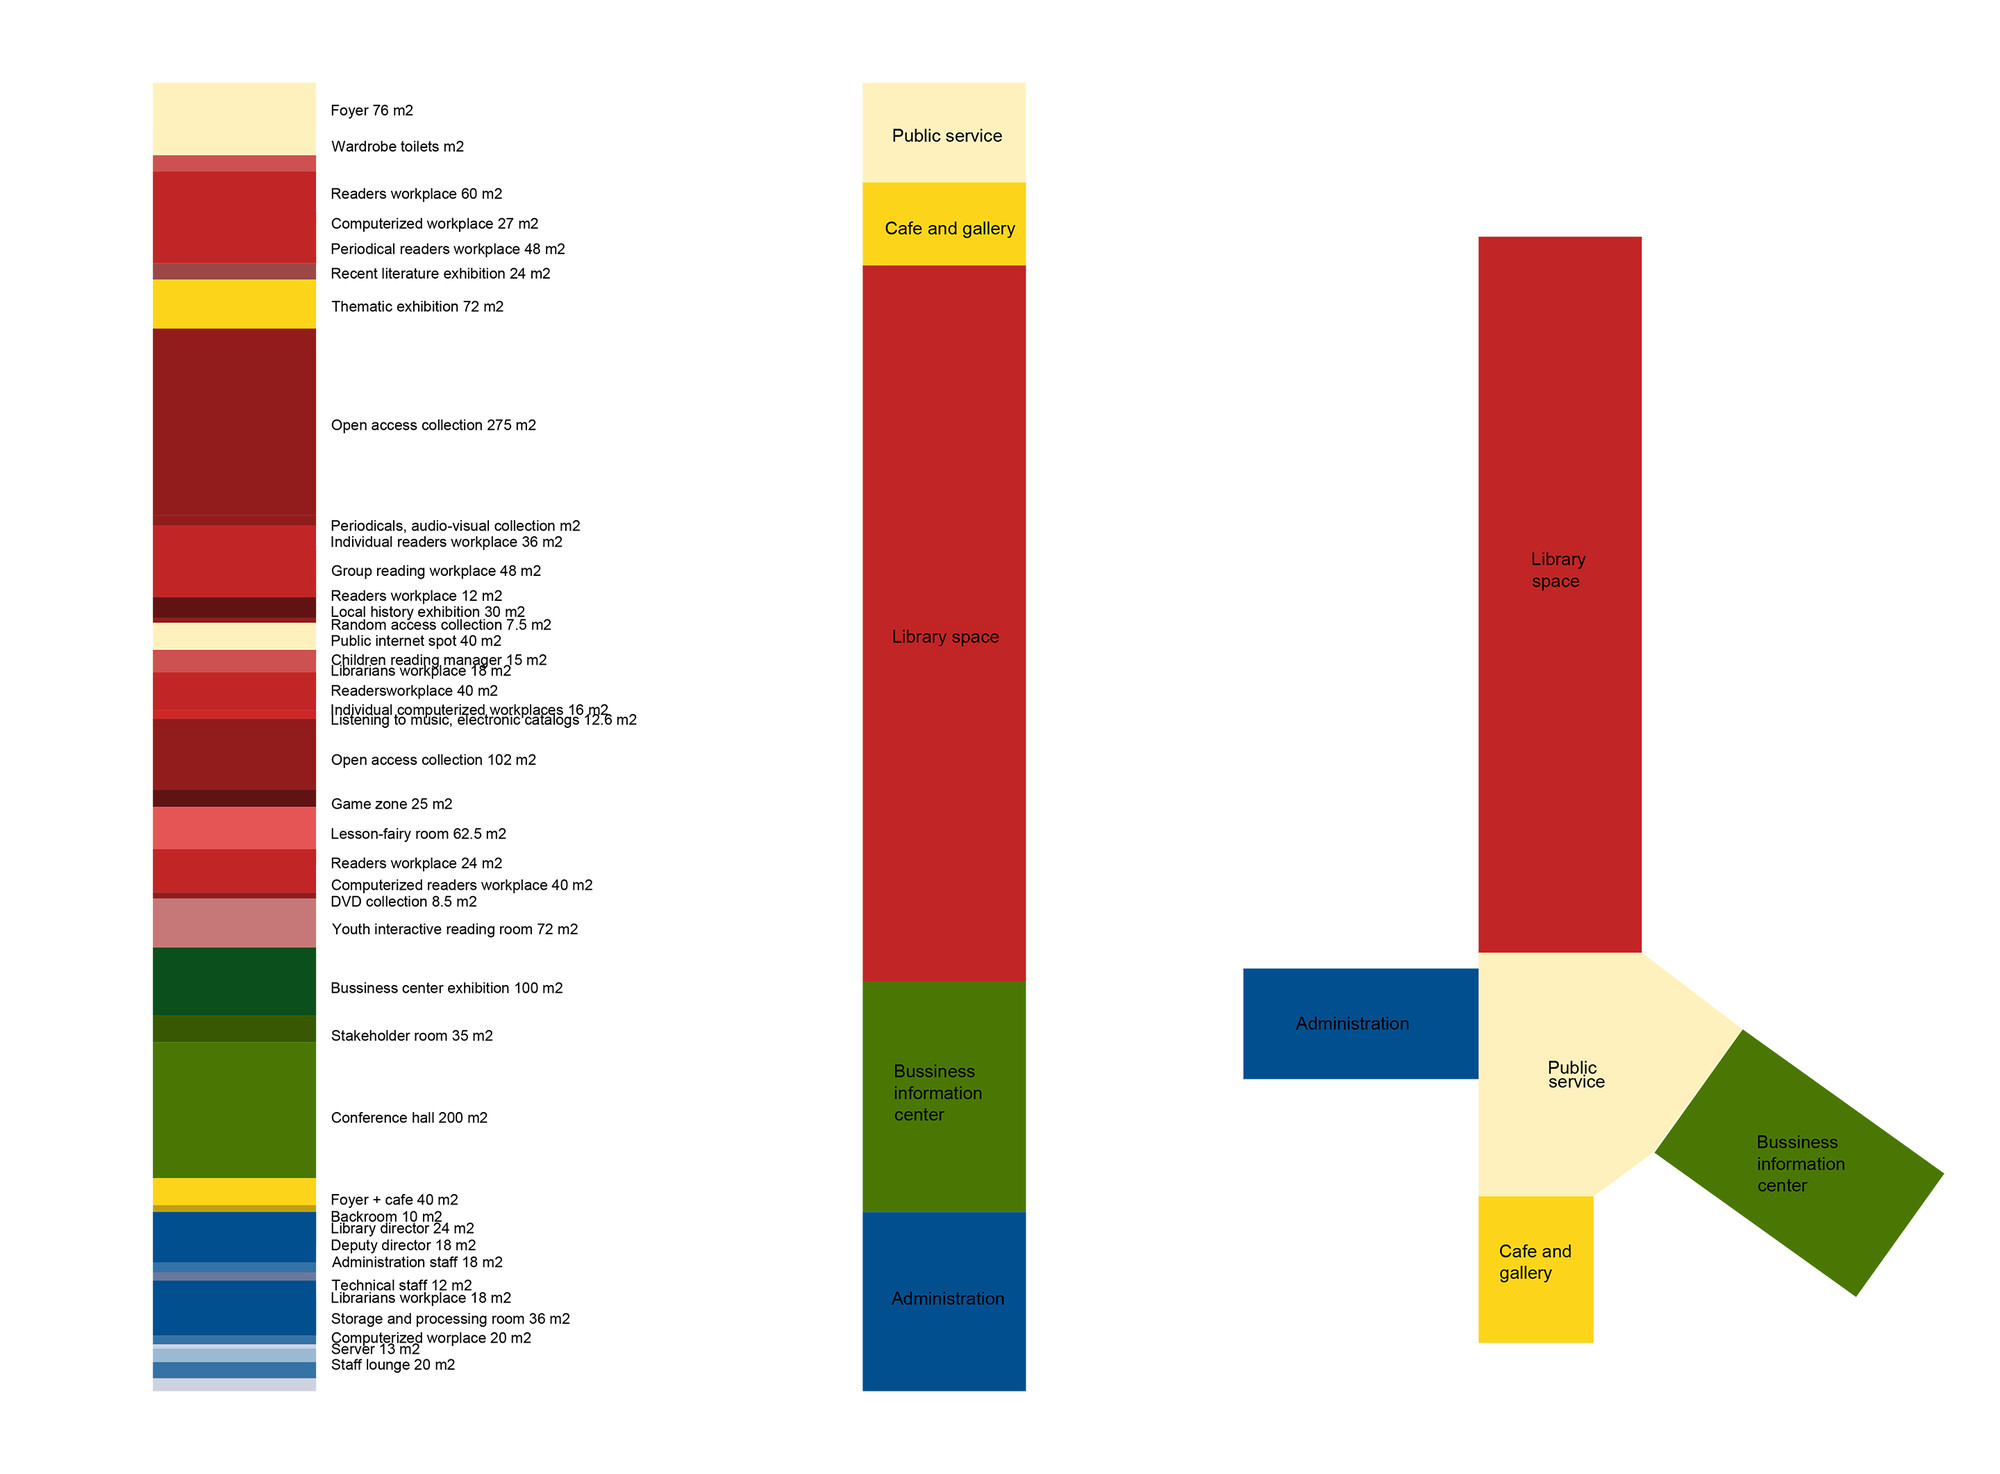 library building in bauska winning proposal program diagram 01 [ 2000 x 1474 Pixel ]